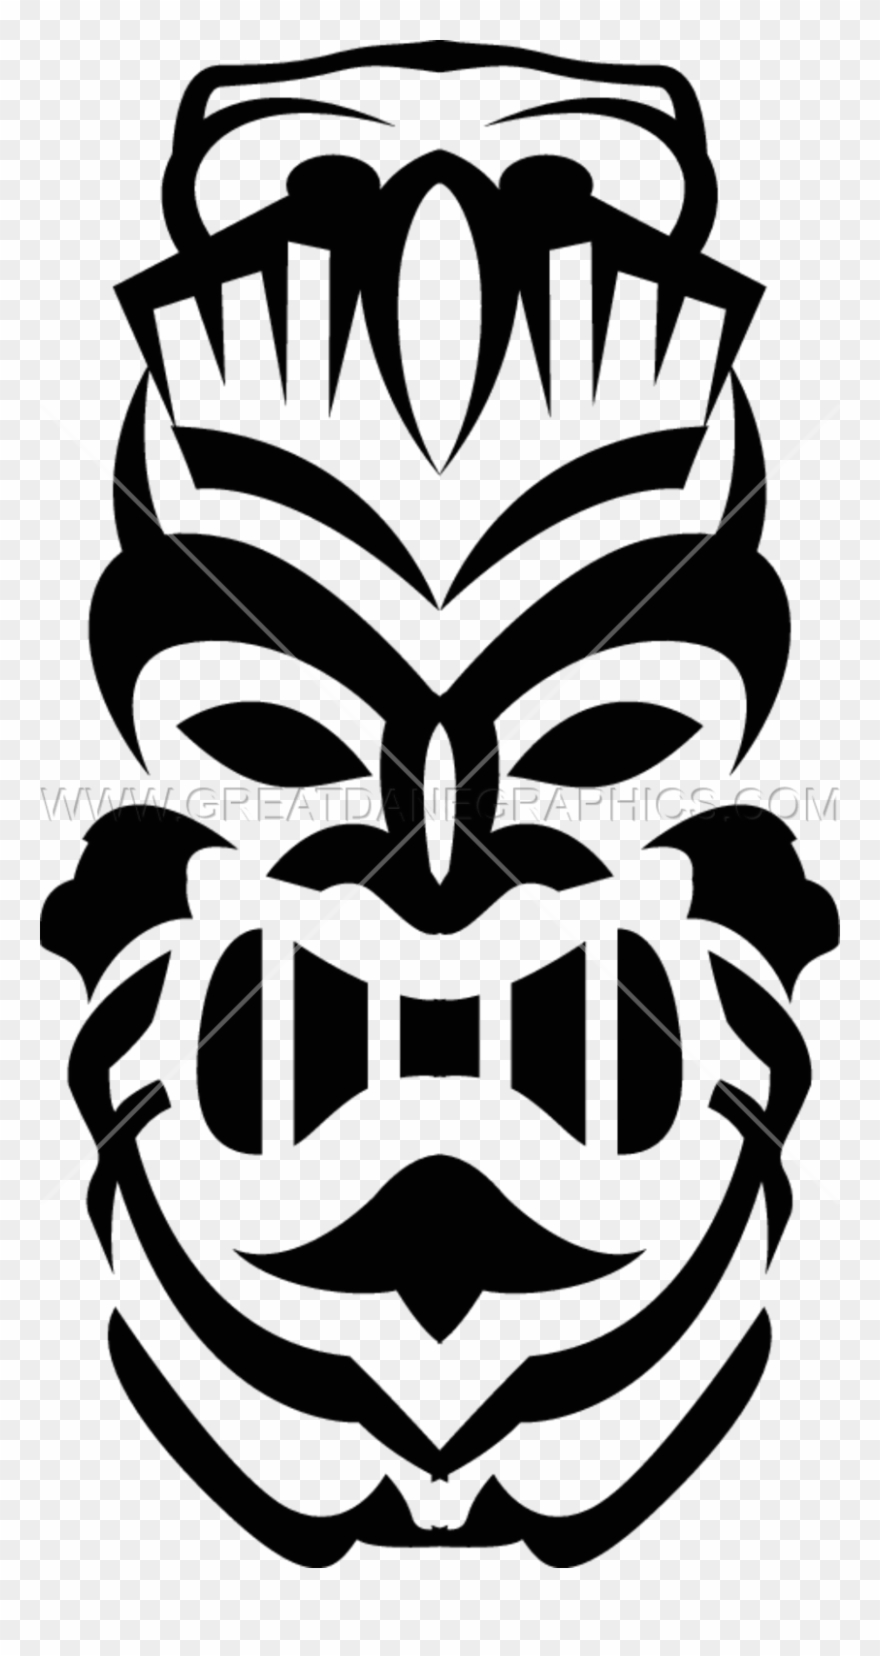 Tiki totem faces black and white clipart clip black and white Stencil Totem Transprent - Tiki Clip Art Black And White ... clip black and white